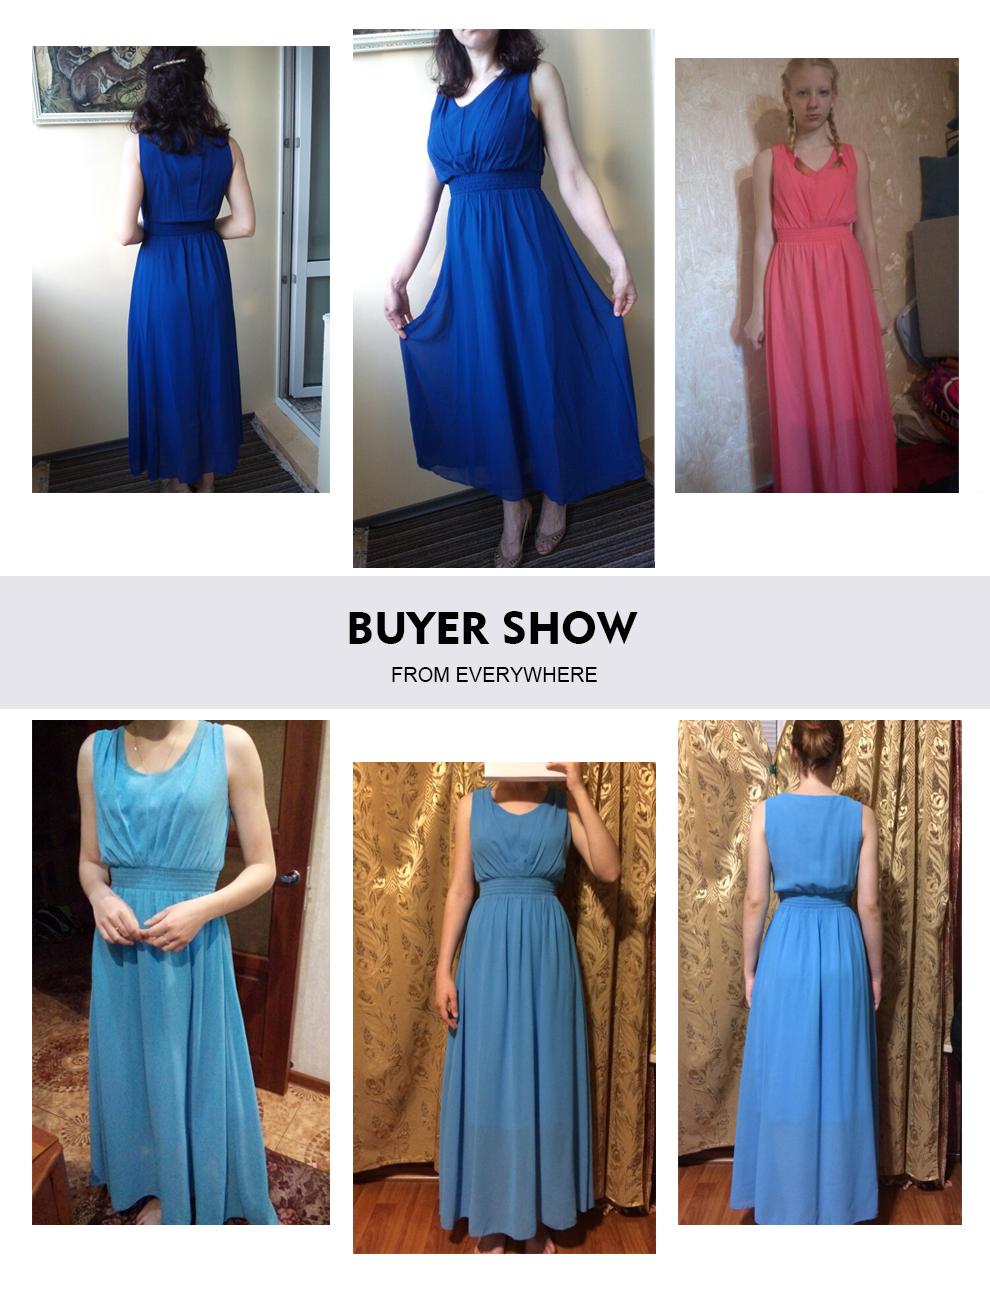 Bohemian Dress Slim Sleeveless Beach V-Neck 6 Color Cute Style (Us 6-12)